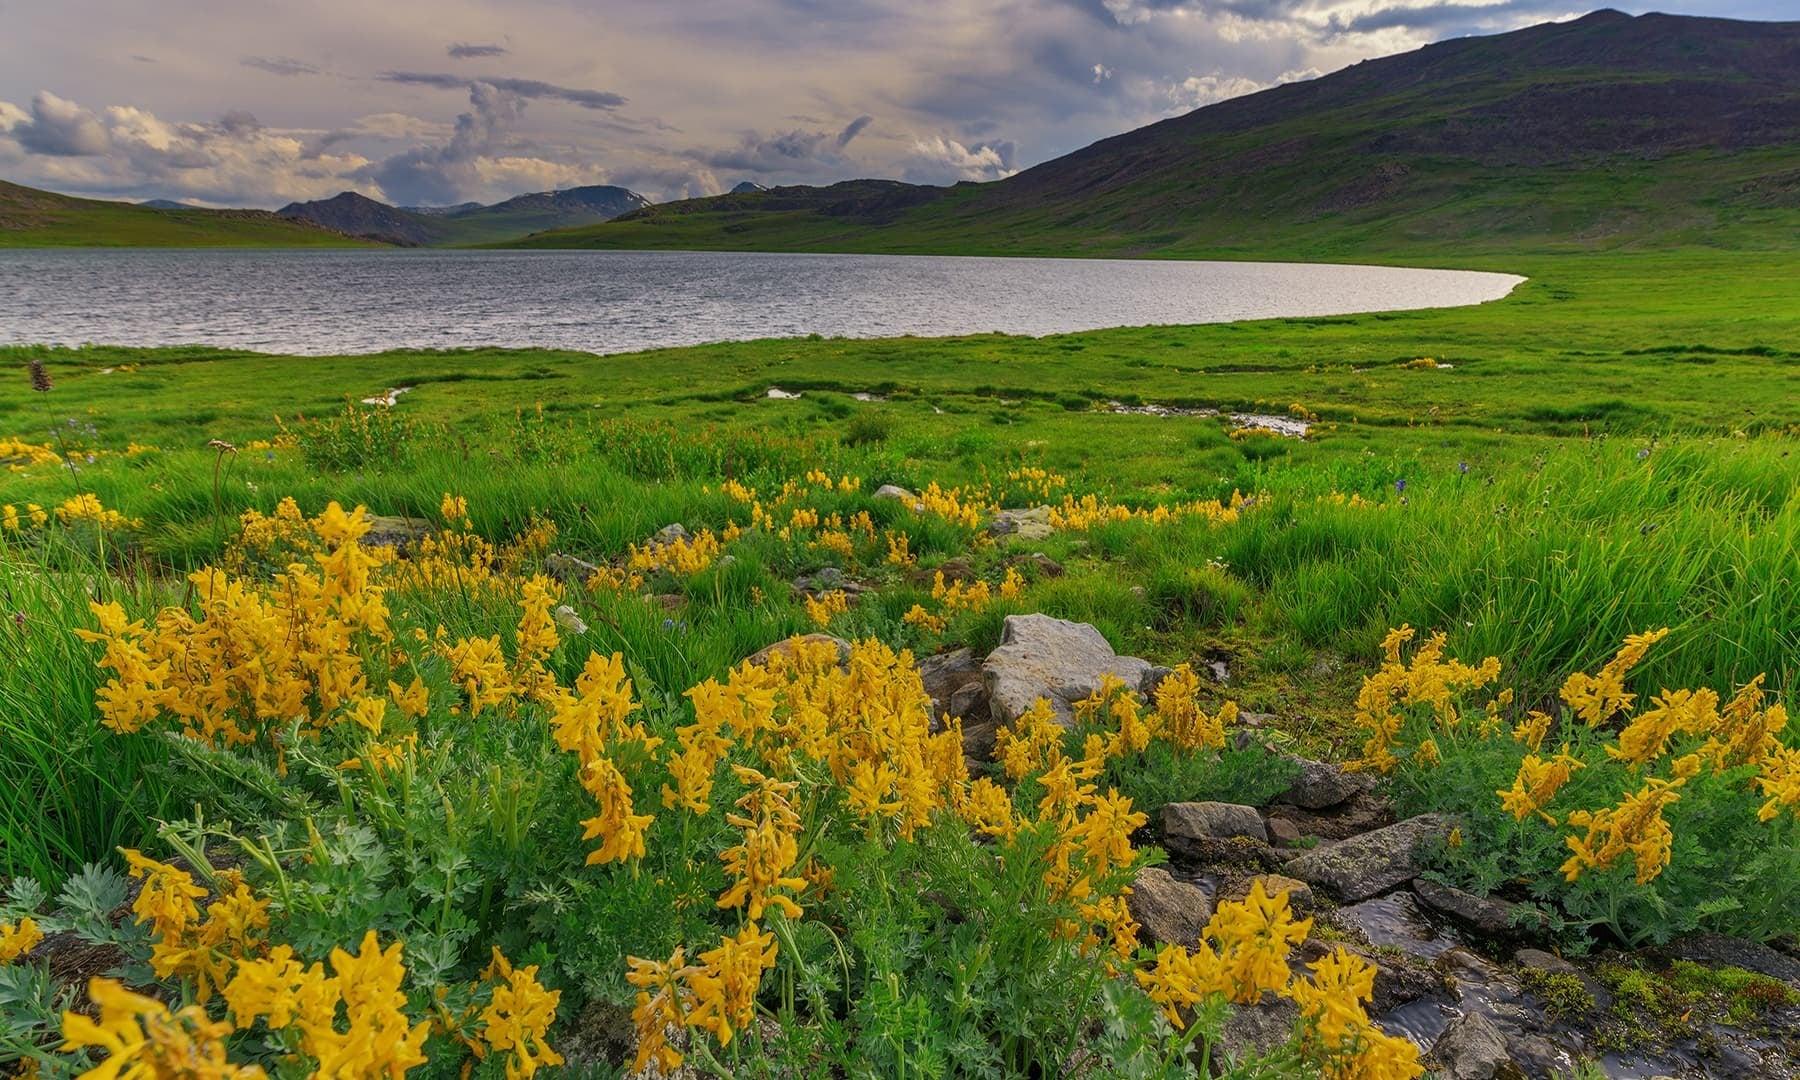 On the banks of Sheosar Lake. — Photo by Syed Mehdi Bukhari